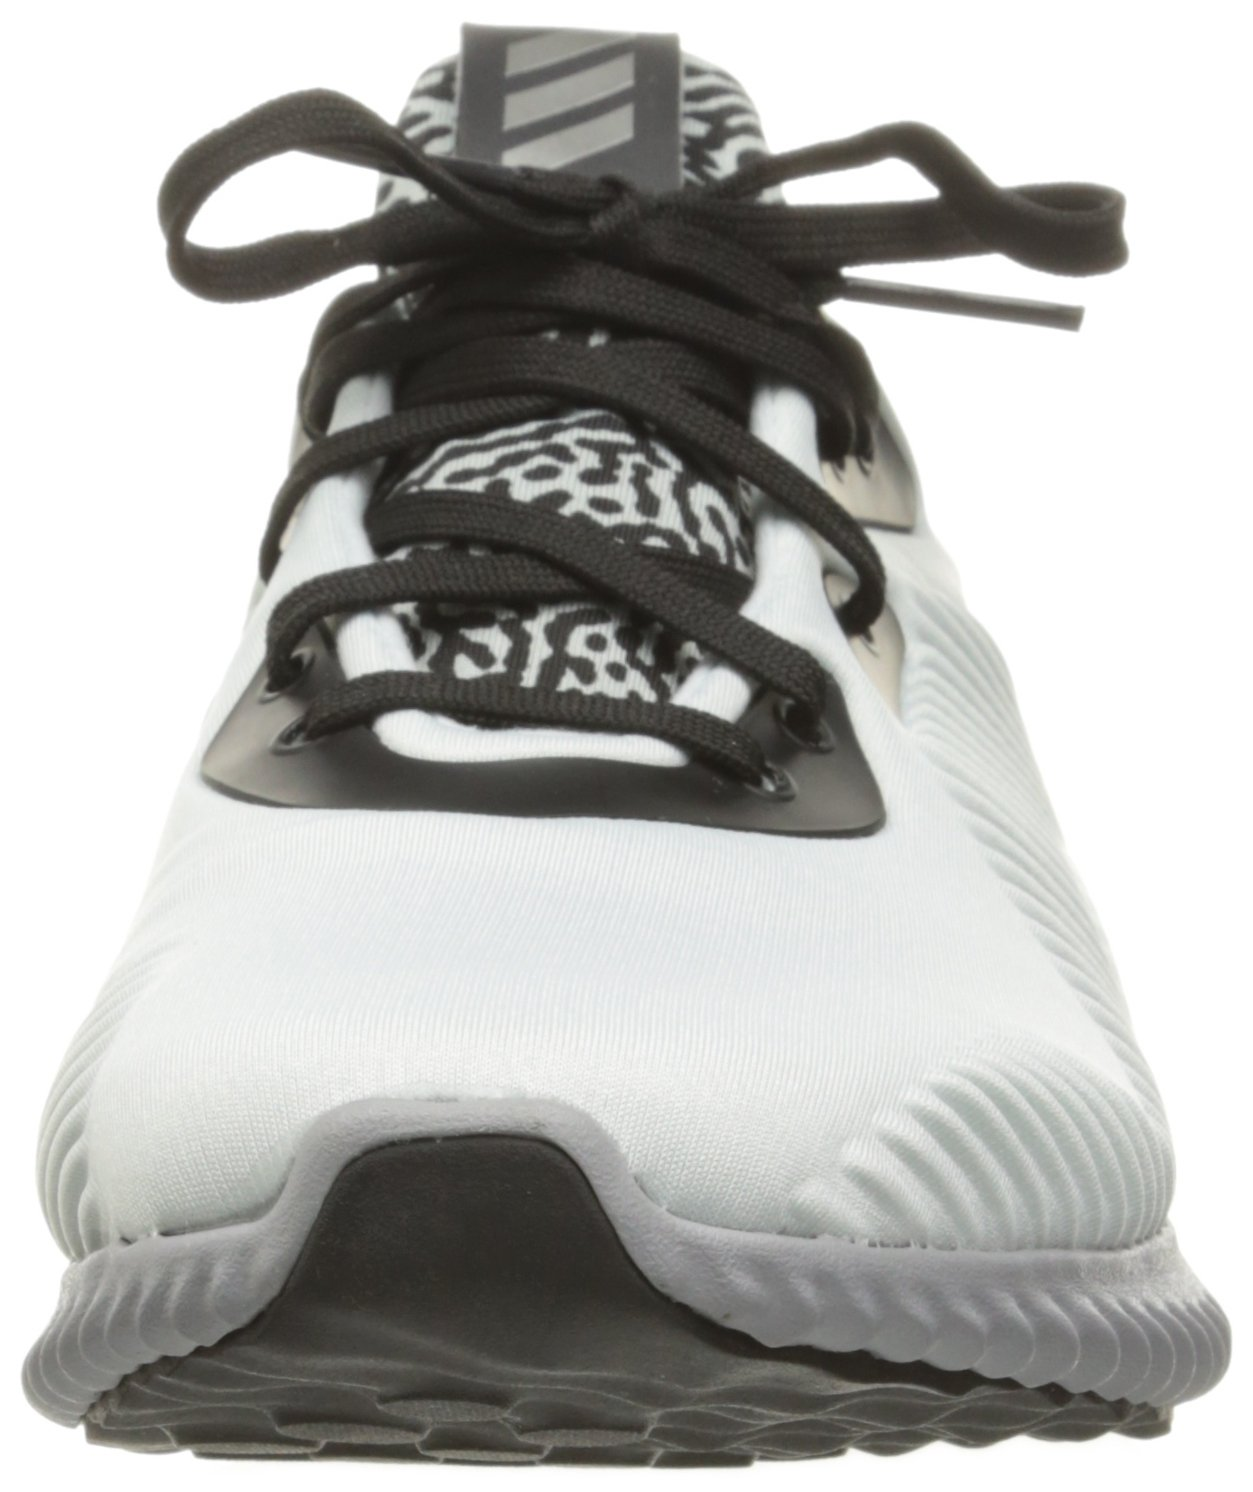 adidas performance politica alphabounce ferro alluminio metallico.